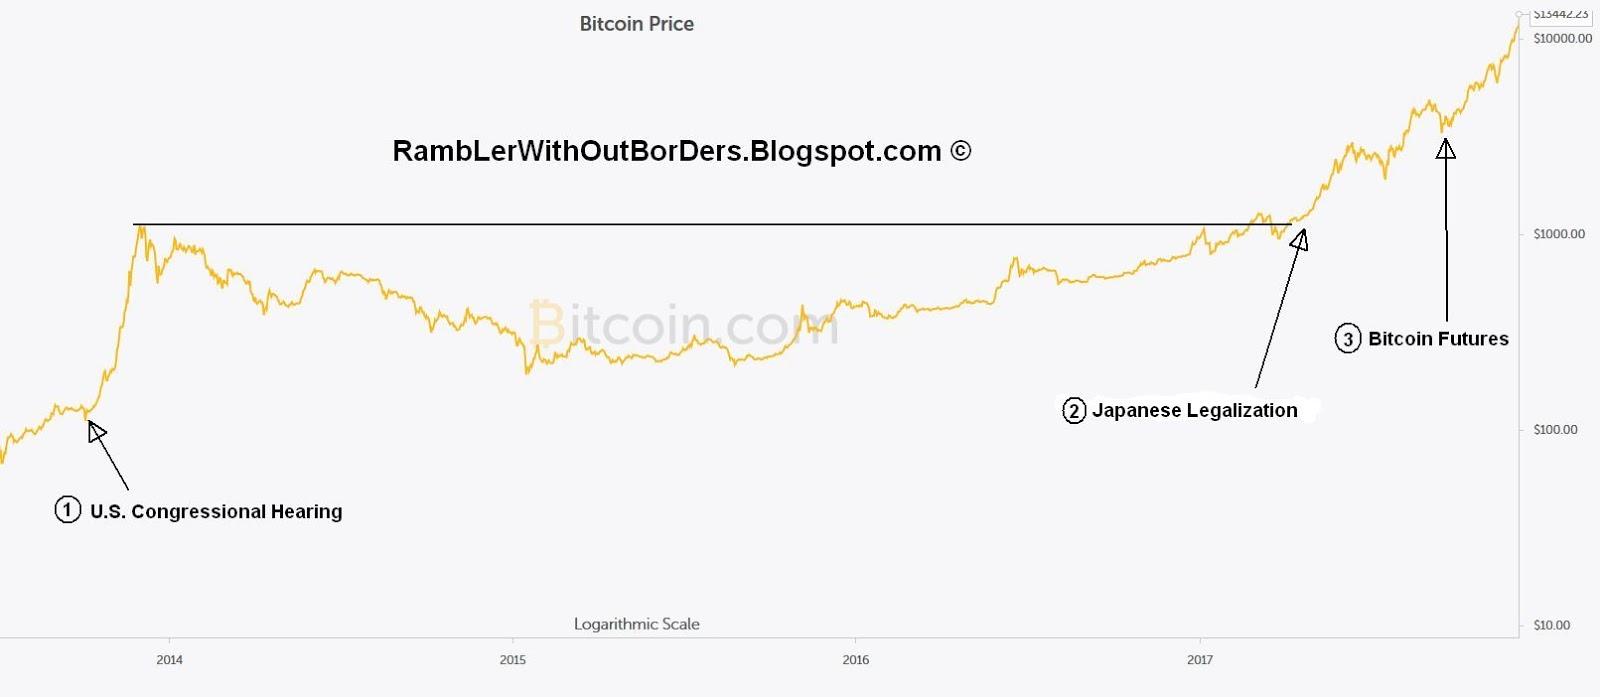 Bitcoin milestone developments from 2013 to 2017